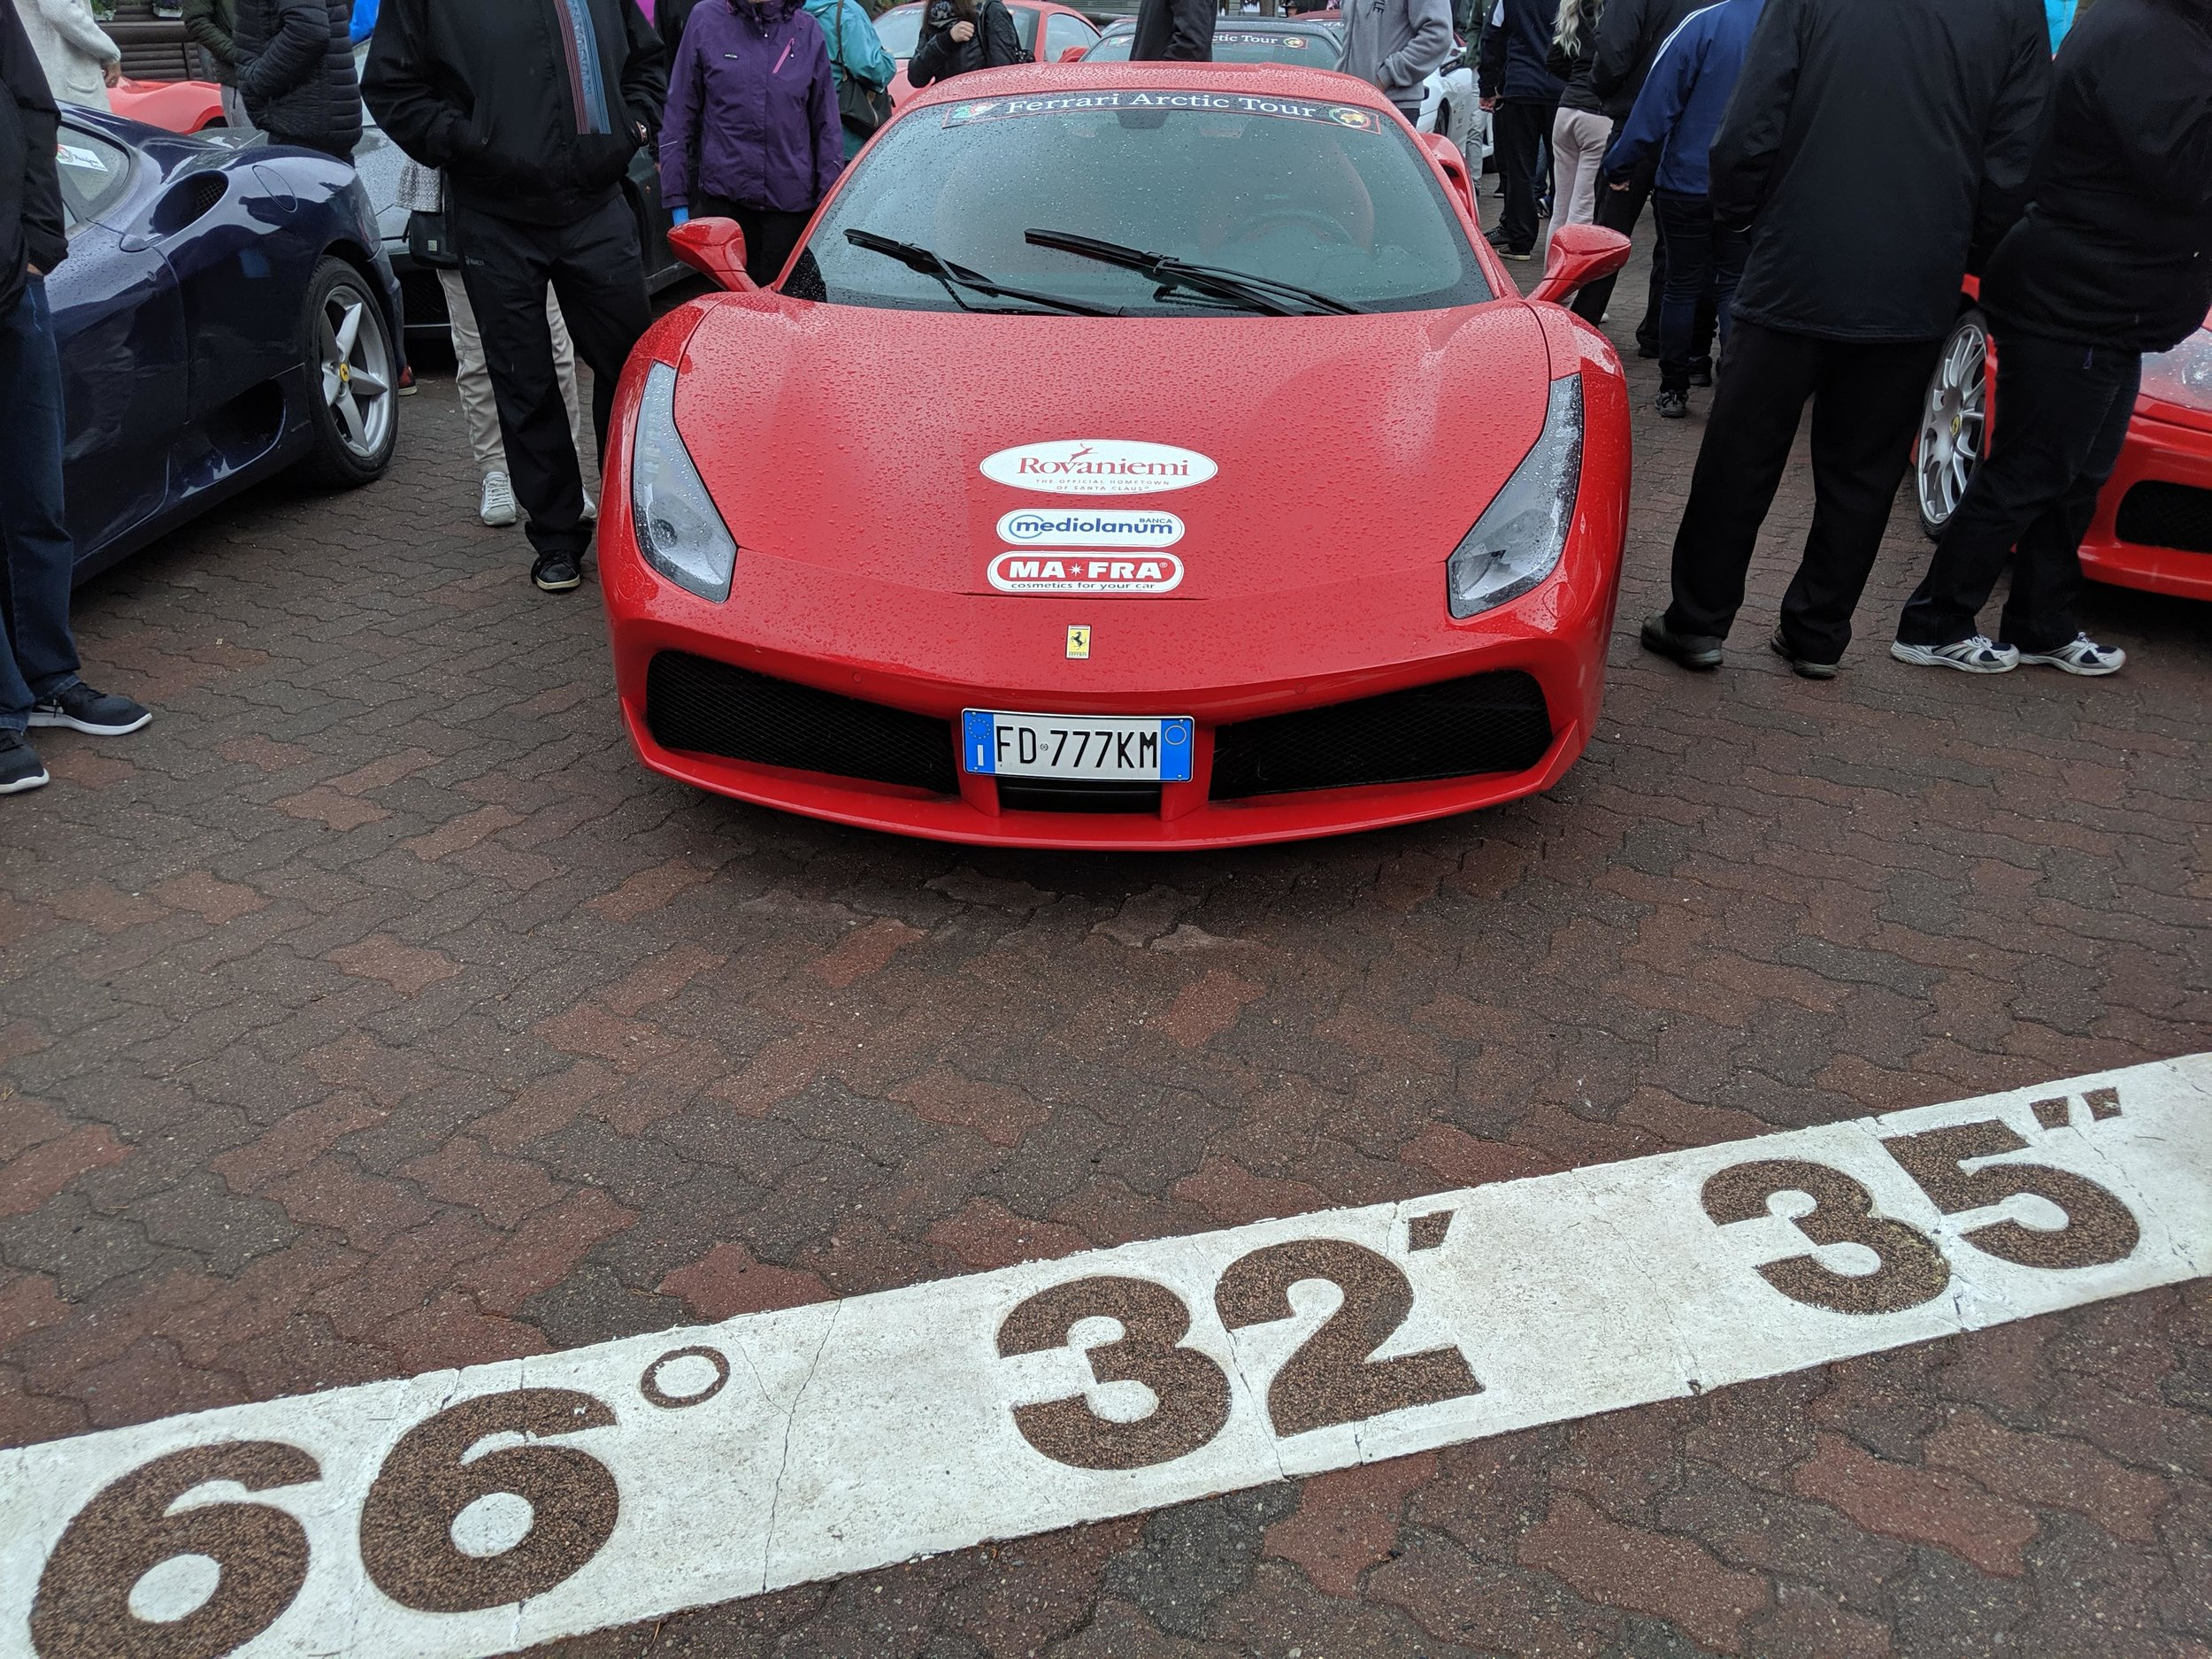 Ferraris at the Arctic Circle